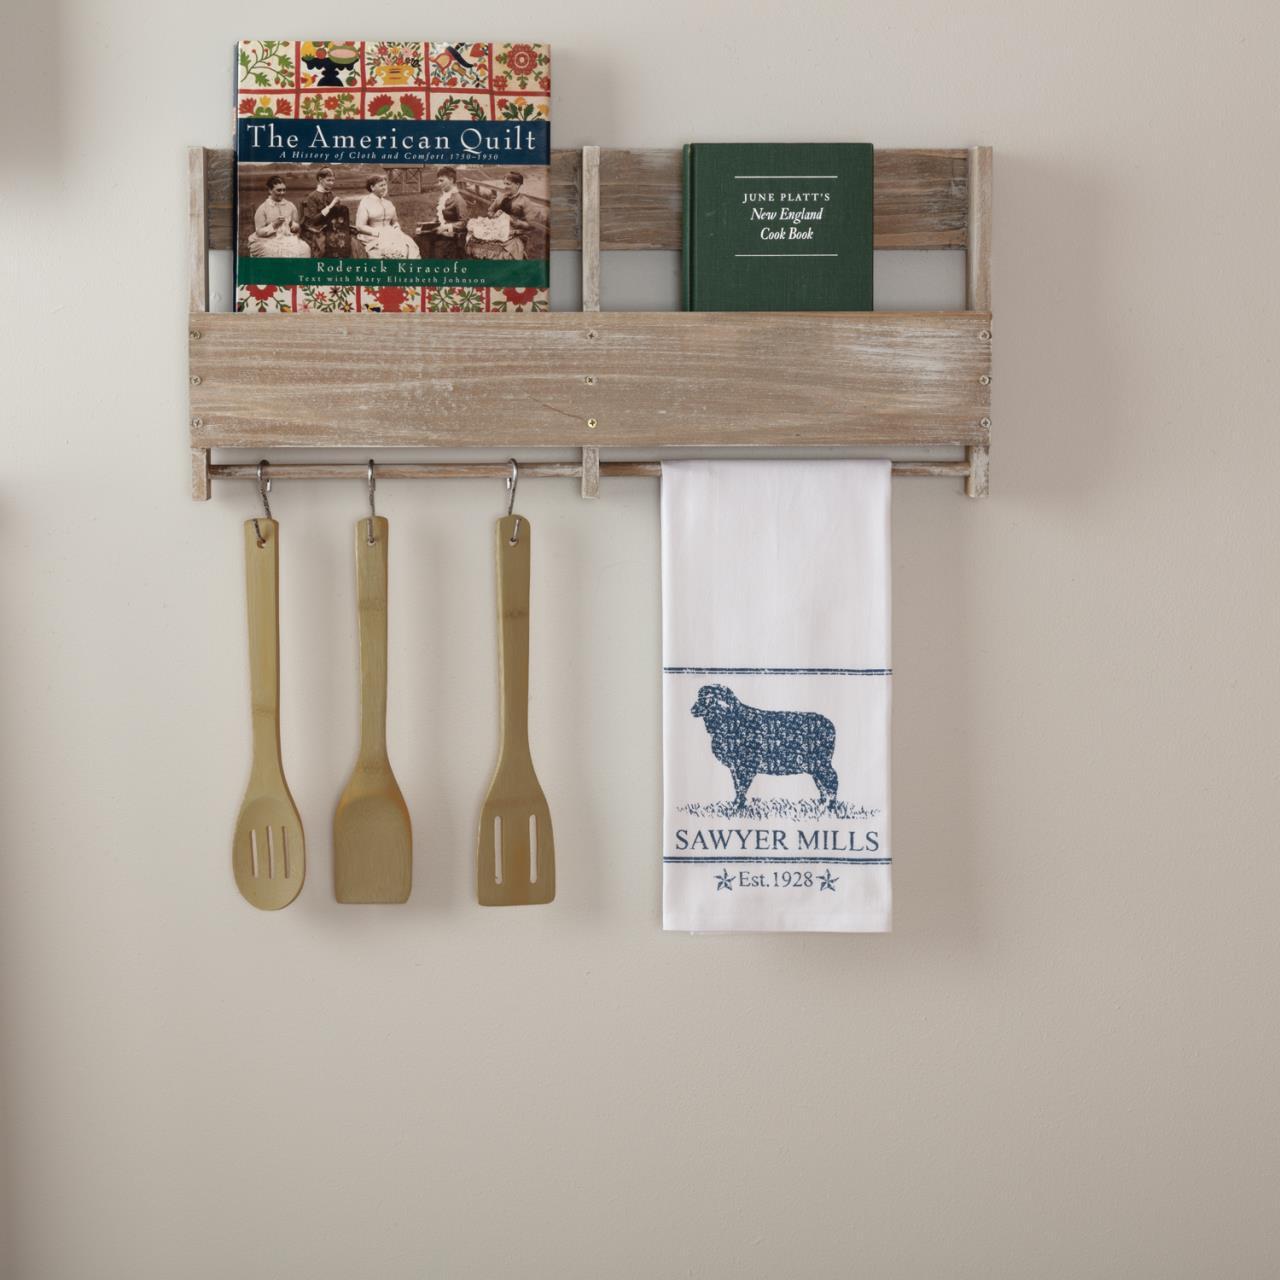 Sawyer Mill Blue Lamb Muslin Bleached White Tea Towel - 840528180590